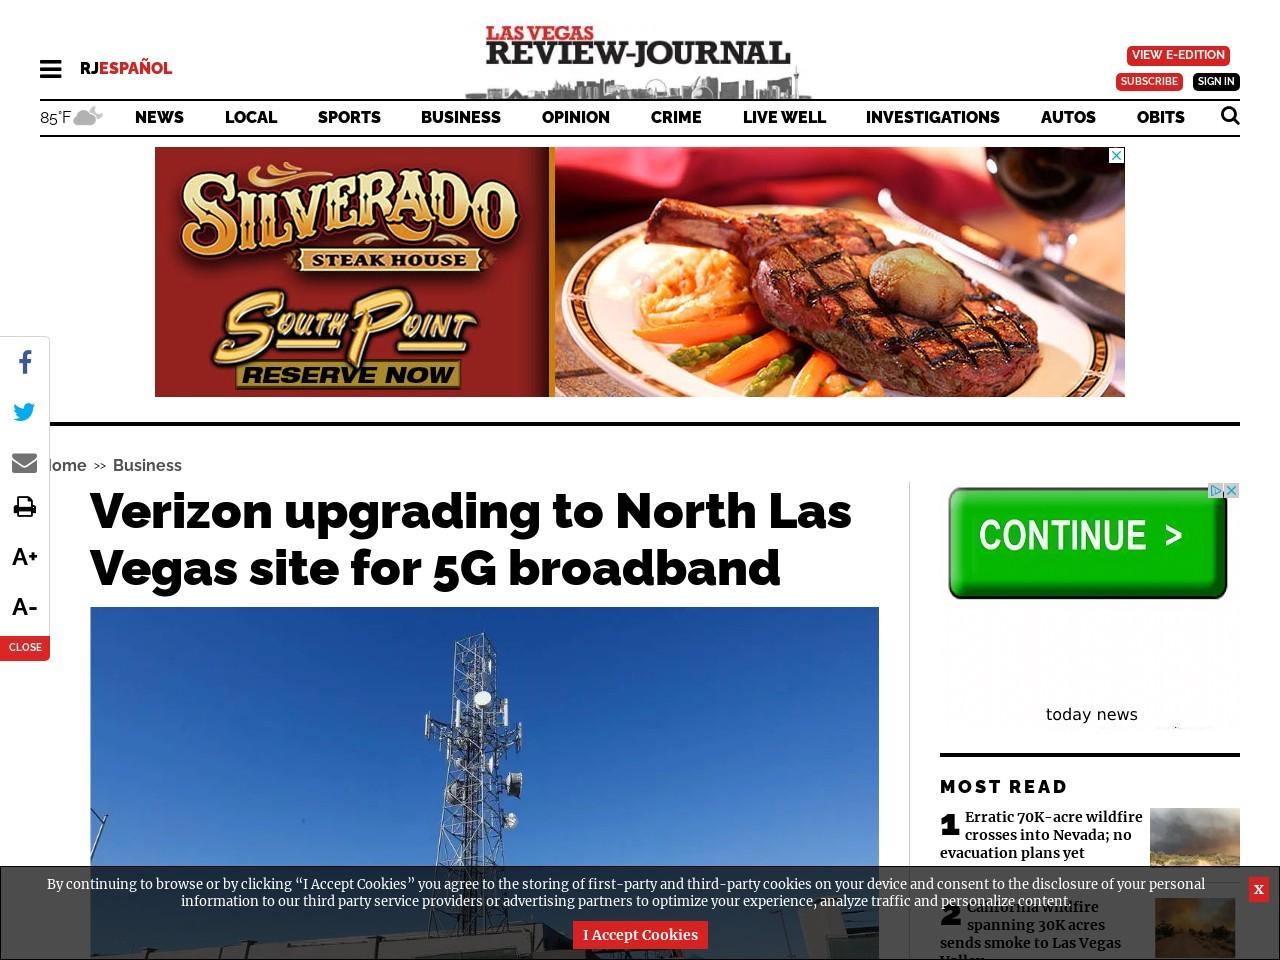 Verizon upgrading to North Las Vegas site for 5G broadband